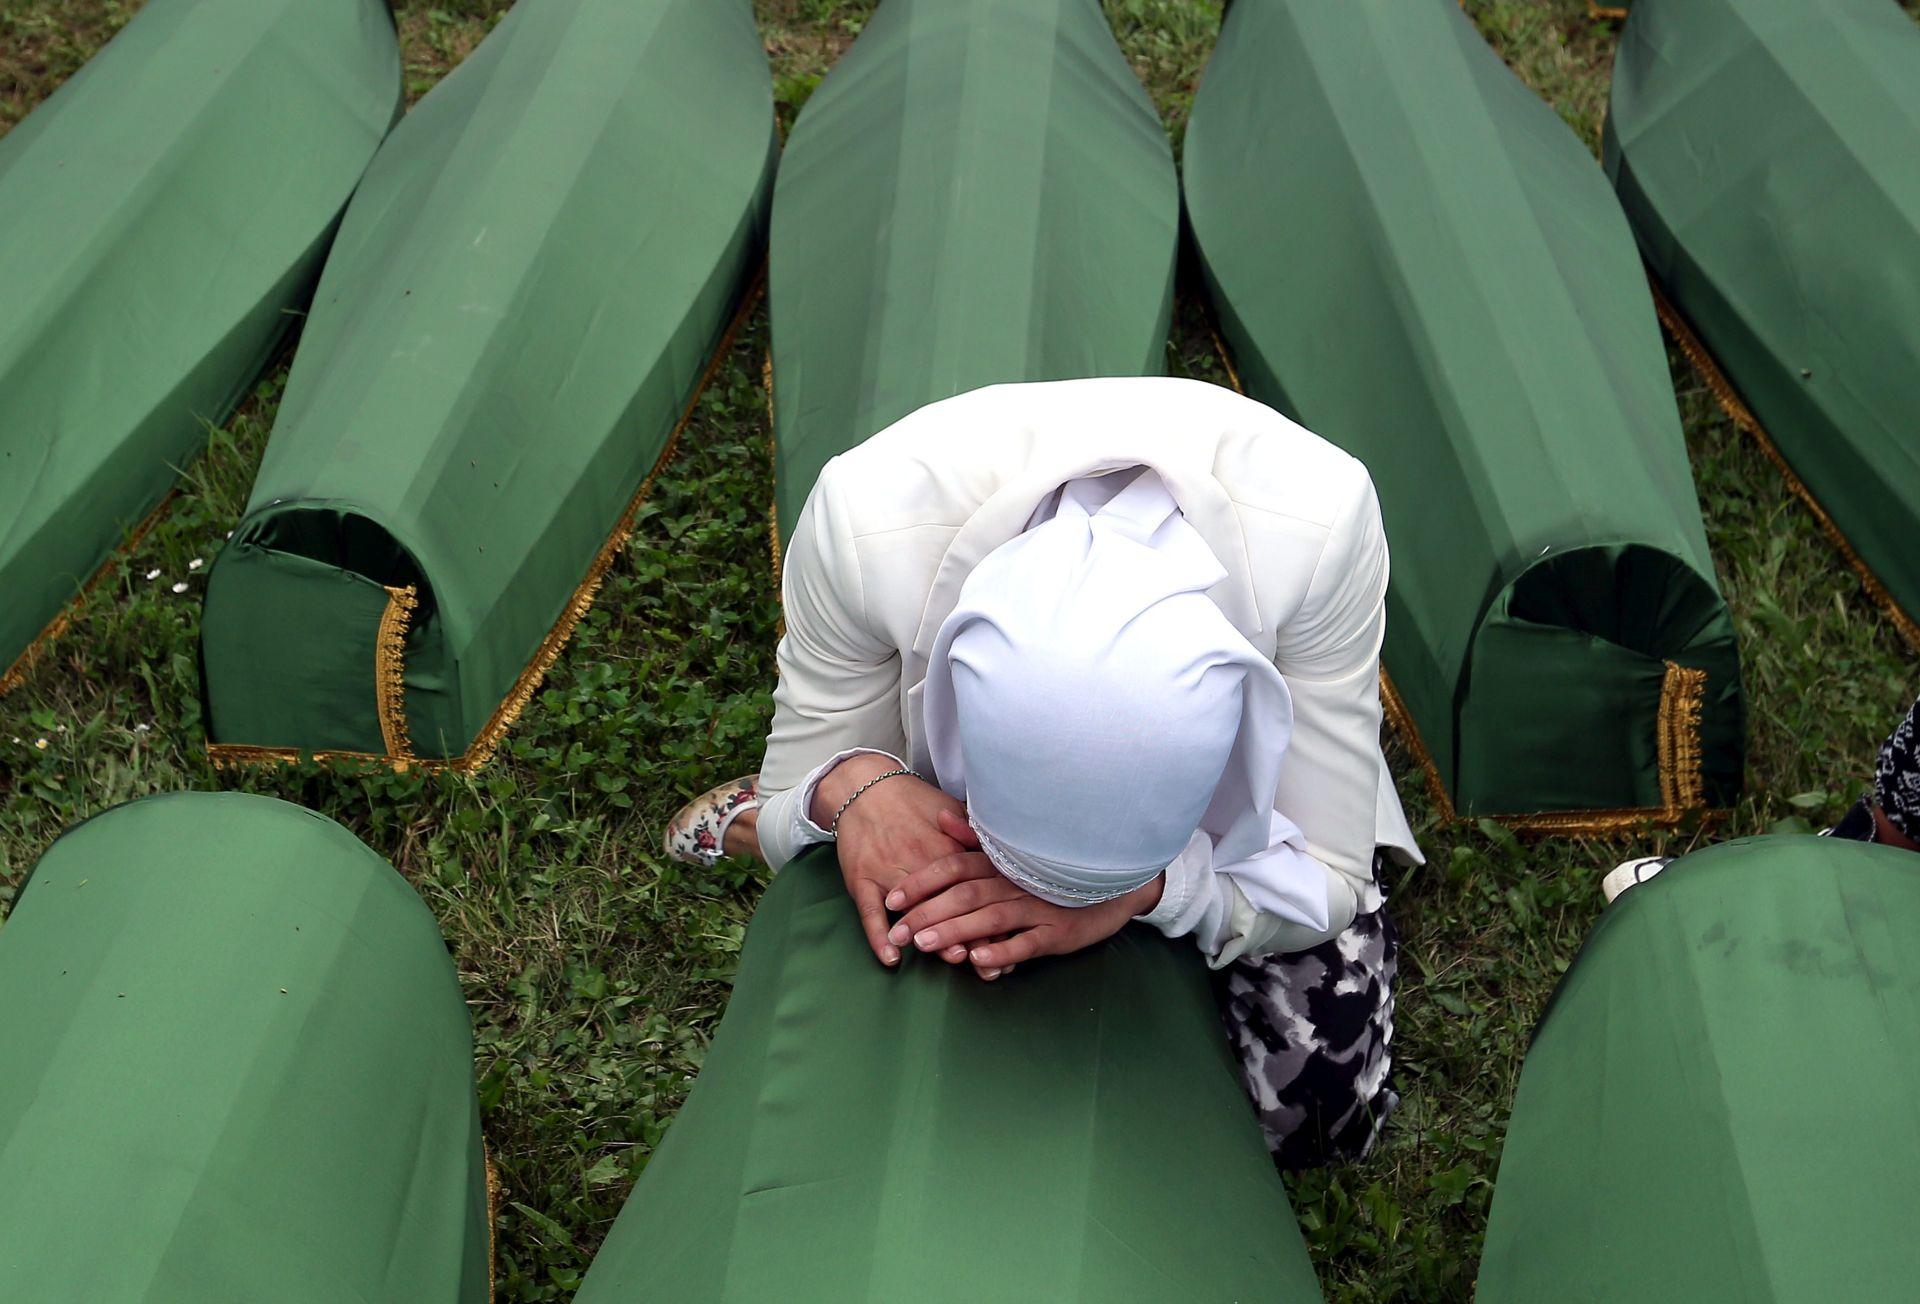 BEOGRAD PISAO VS UN-A: Rezolucija o Srebrenici destabilizirala bi regiju